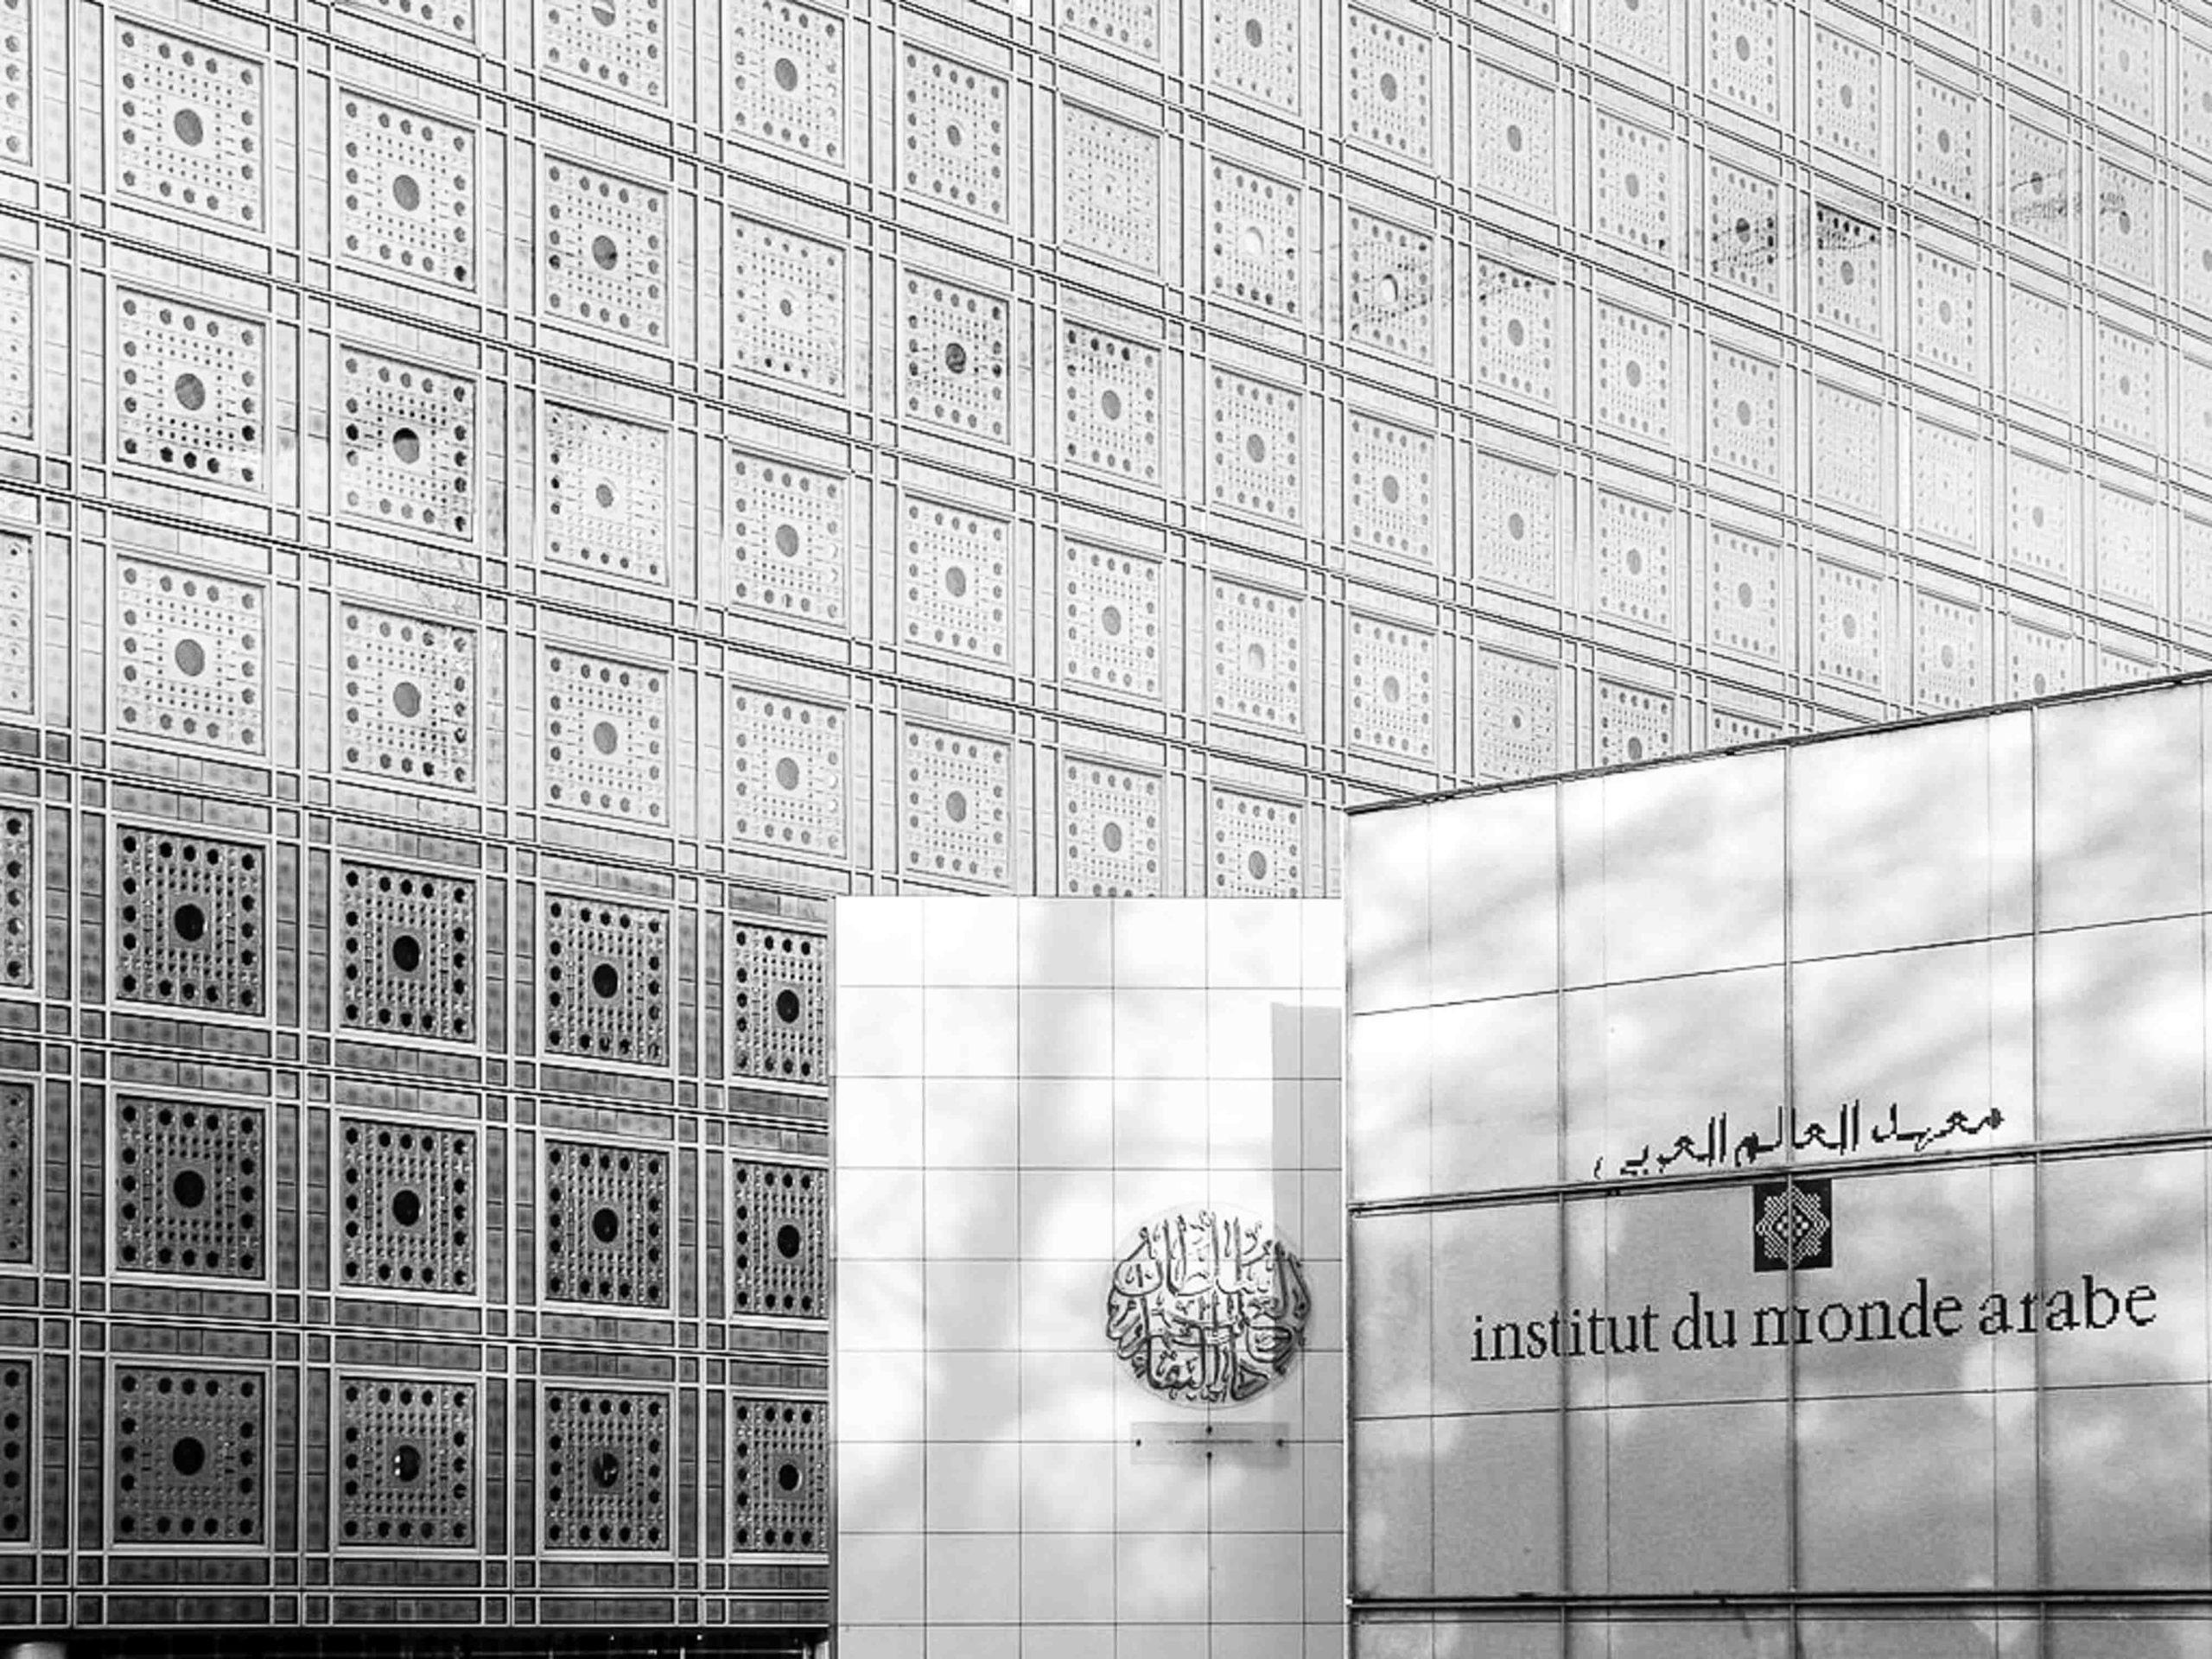 médiation-culturelle-Institut-monde-arabe-2-scaled.jpg